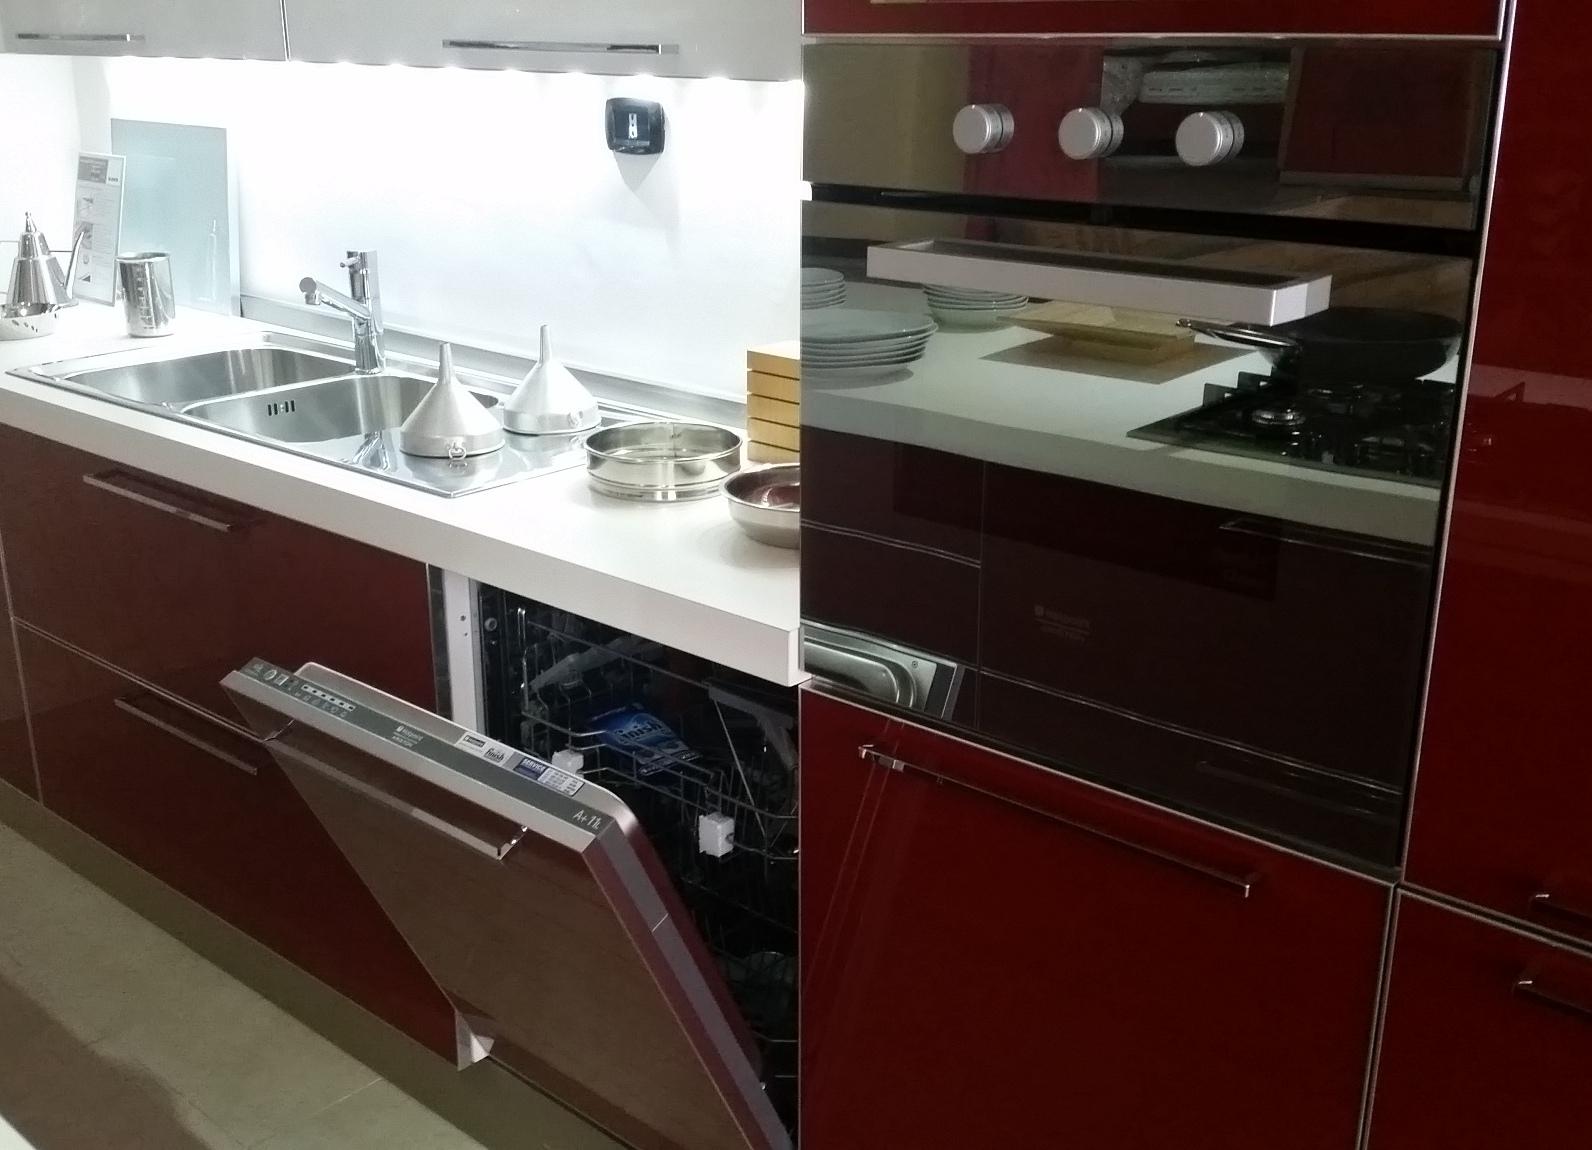 Cucine Usate Catania - Idee Per La Casa - Syafir.com